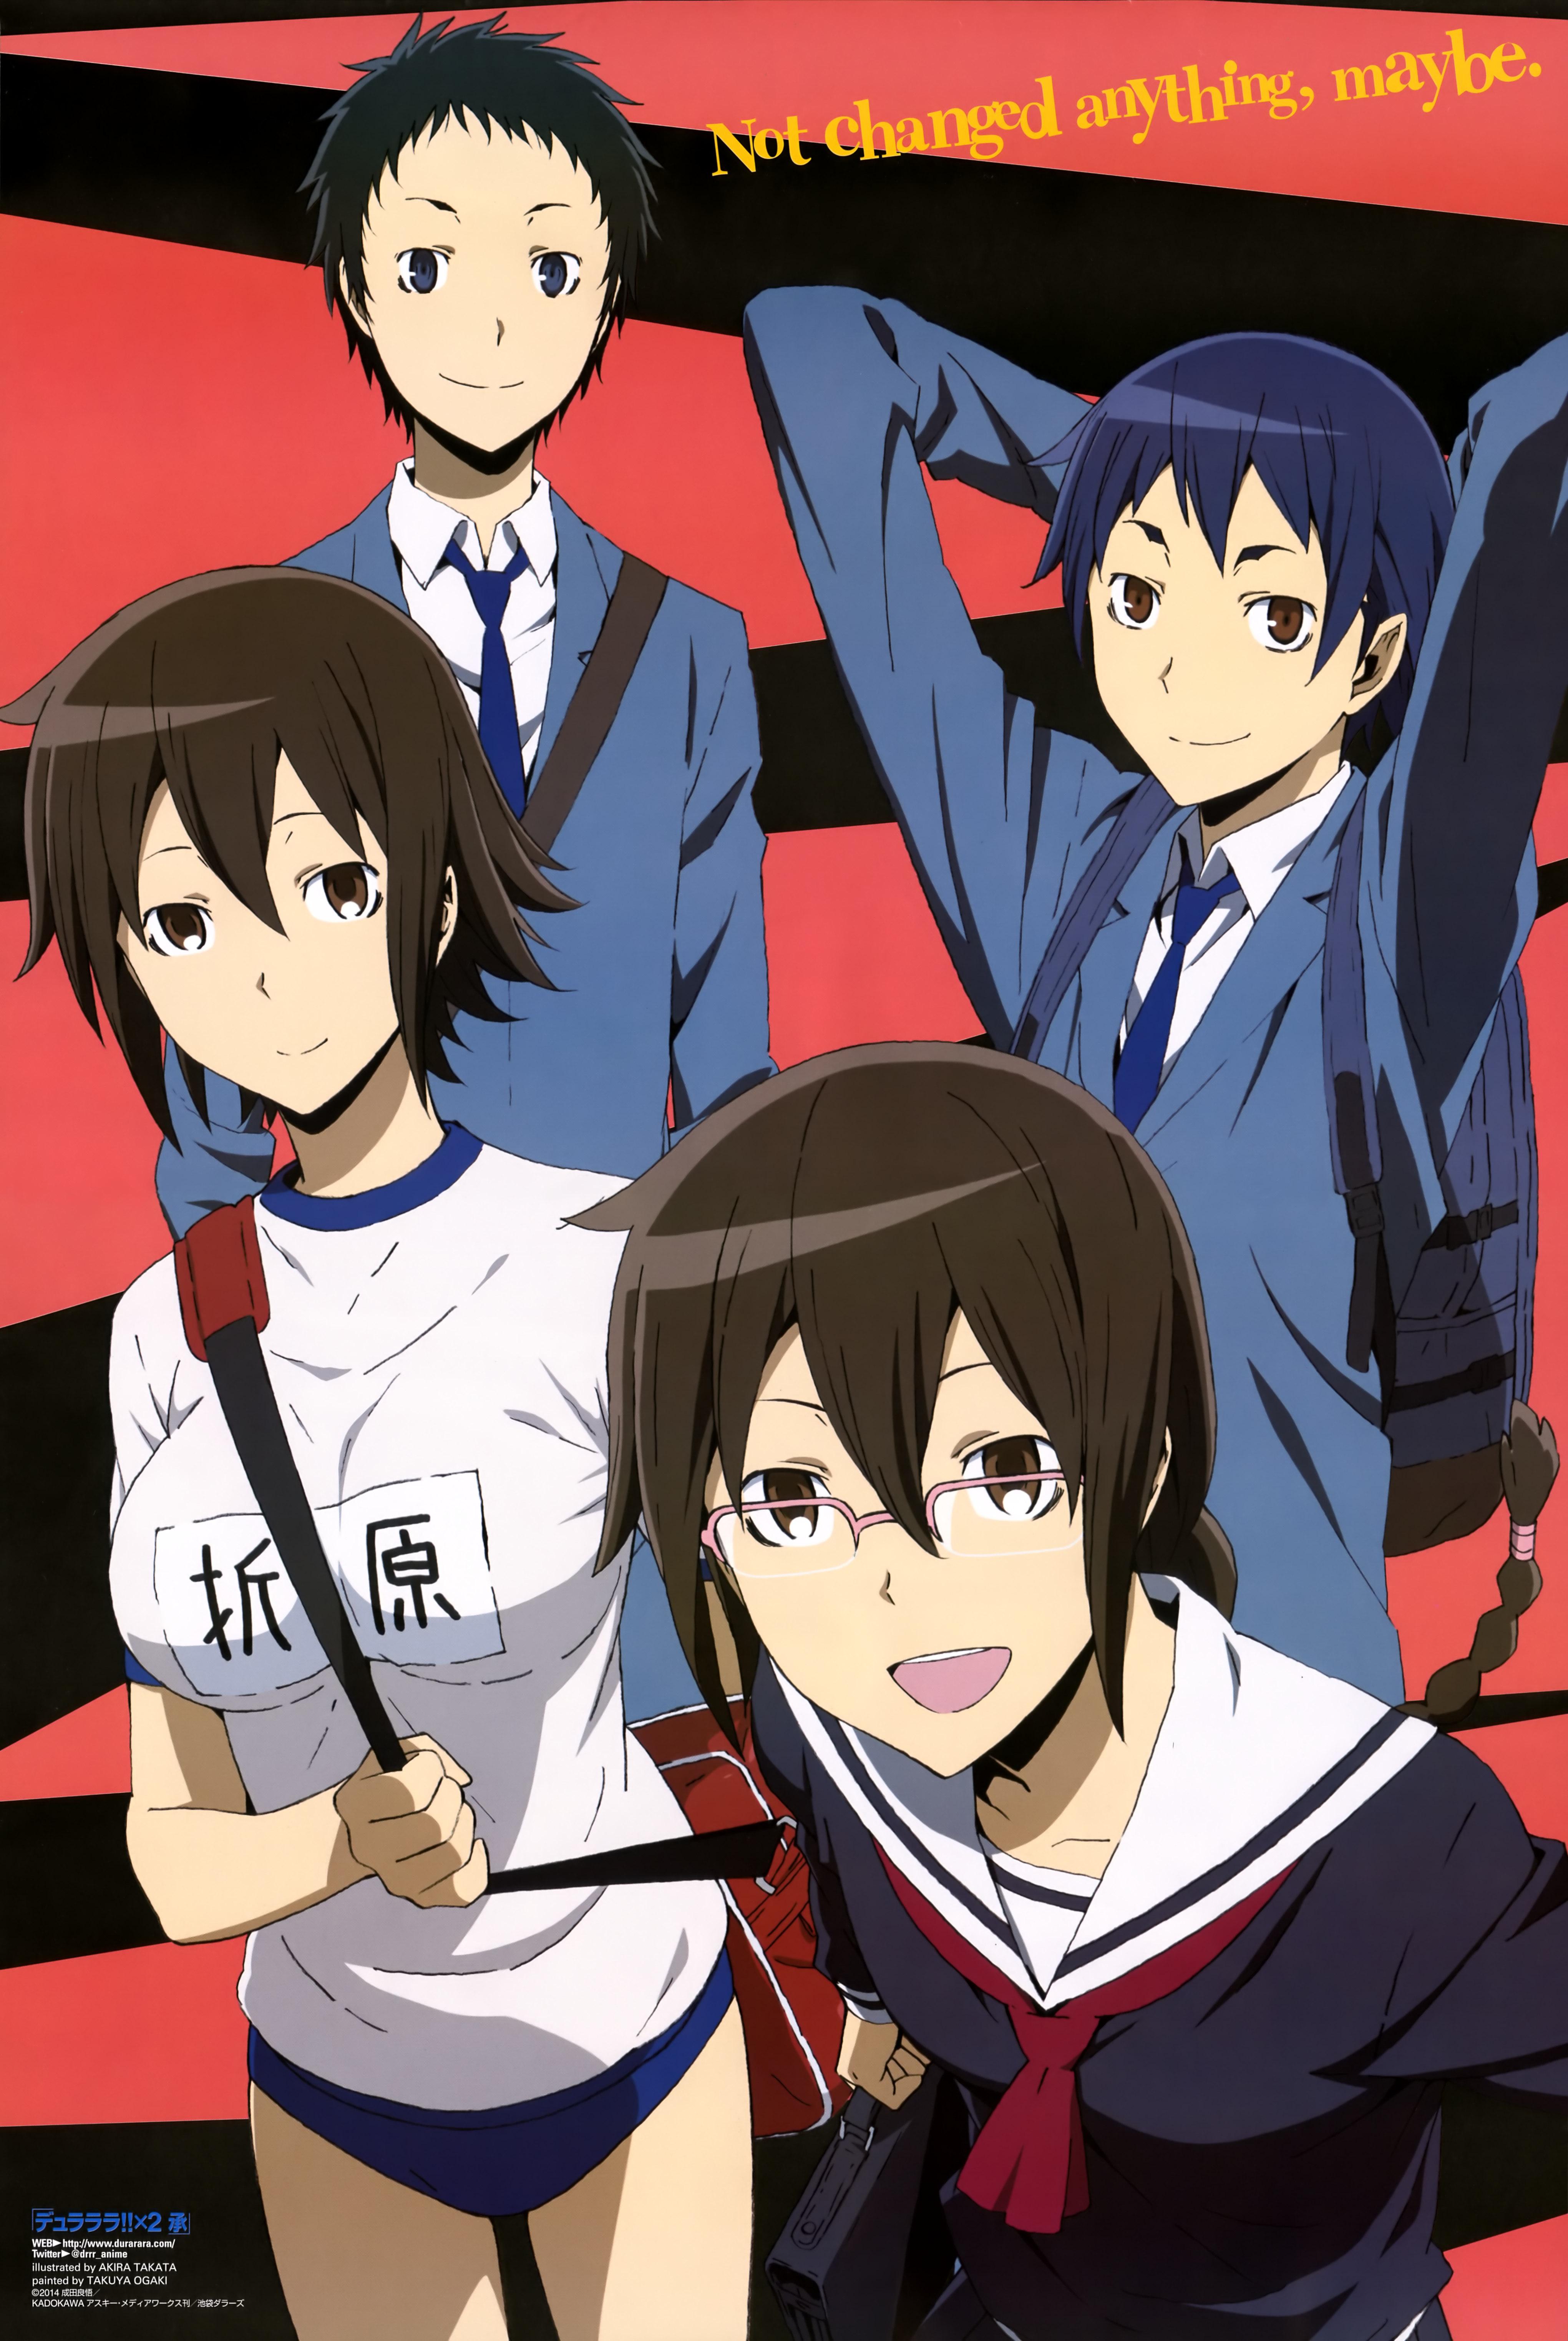 Haruhichan.com Newtype January 2015 posters  buruma durarara!! gym_uniform kuronuma_aoba megane orihara_kururi orihara_mairu ryuugamine_mikado seifuku takata_akira